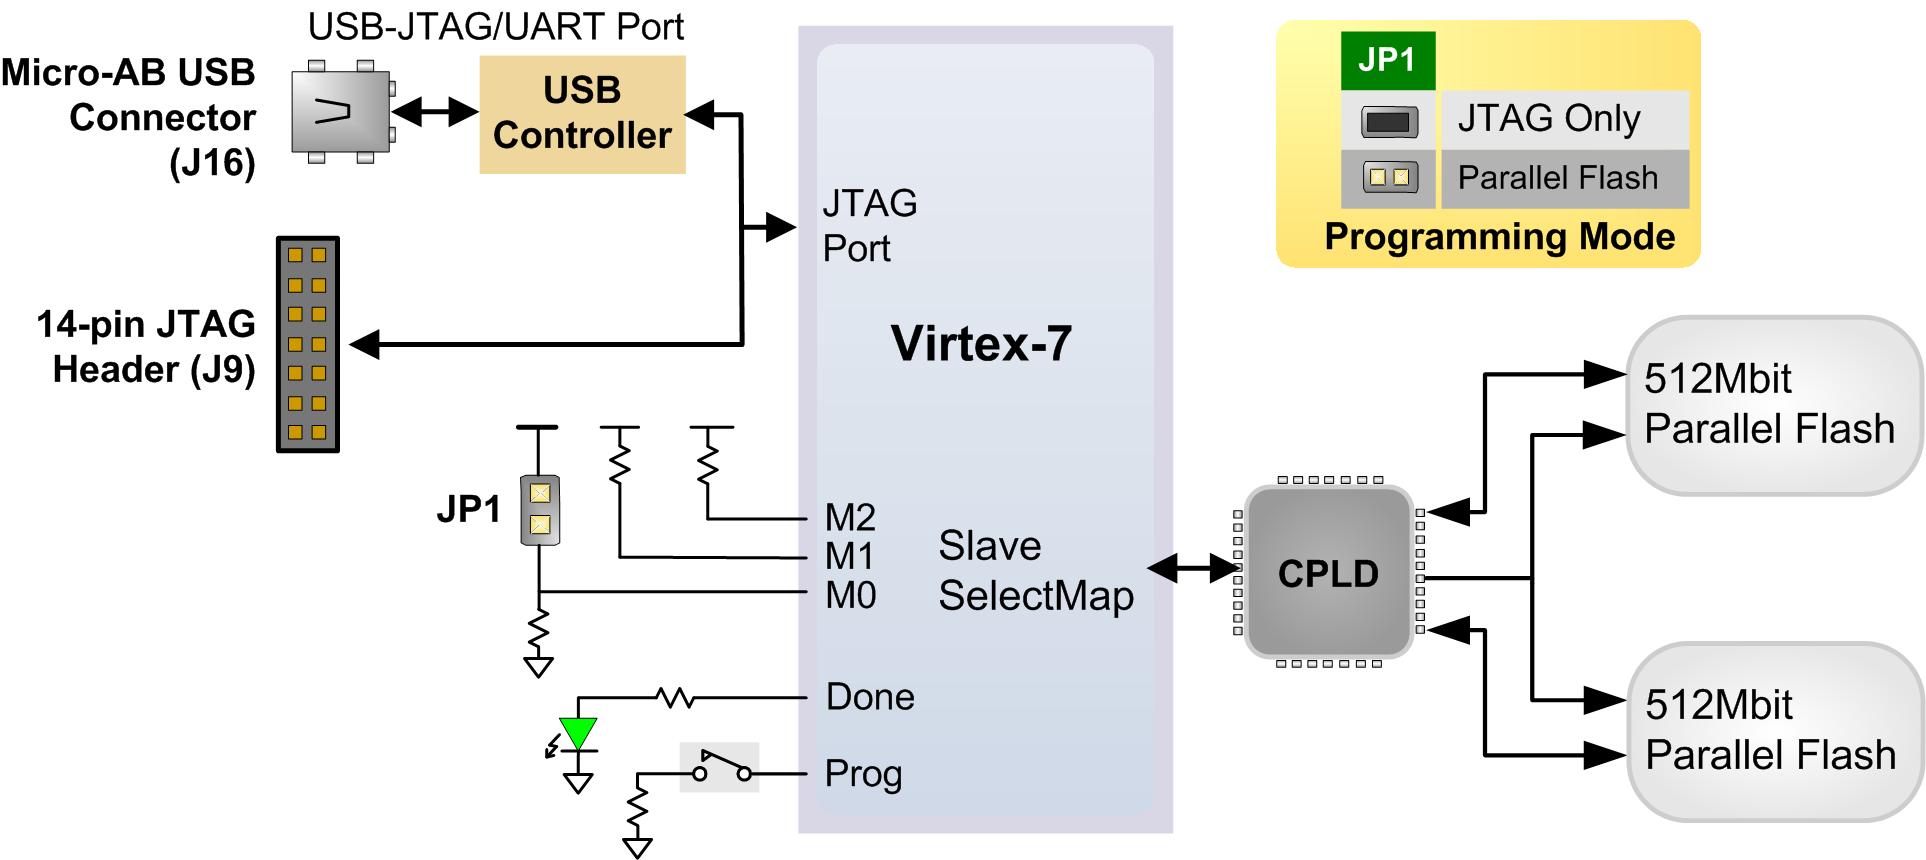 Netfpga Sume Reference Manual Referencedigilentinc Digilent Jtag Cable Schematic Usb Configuration Options